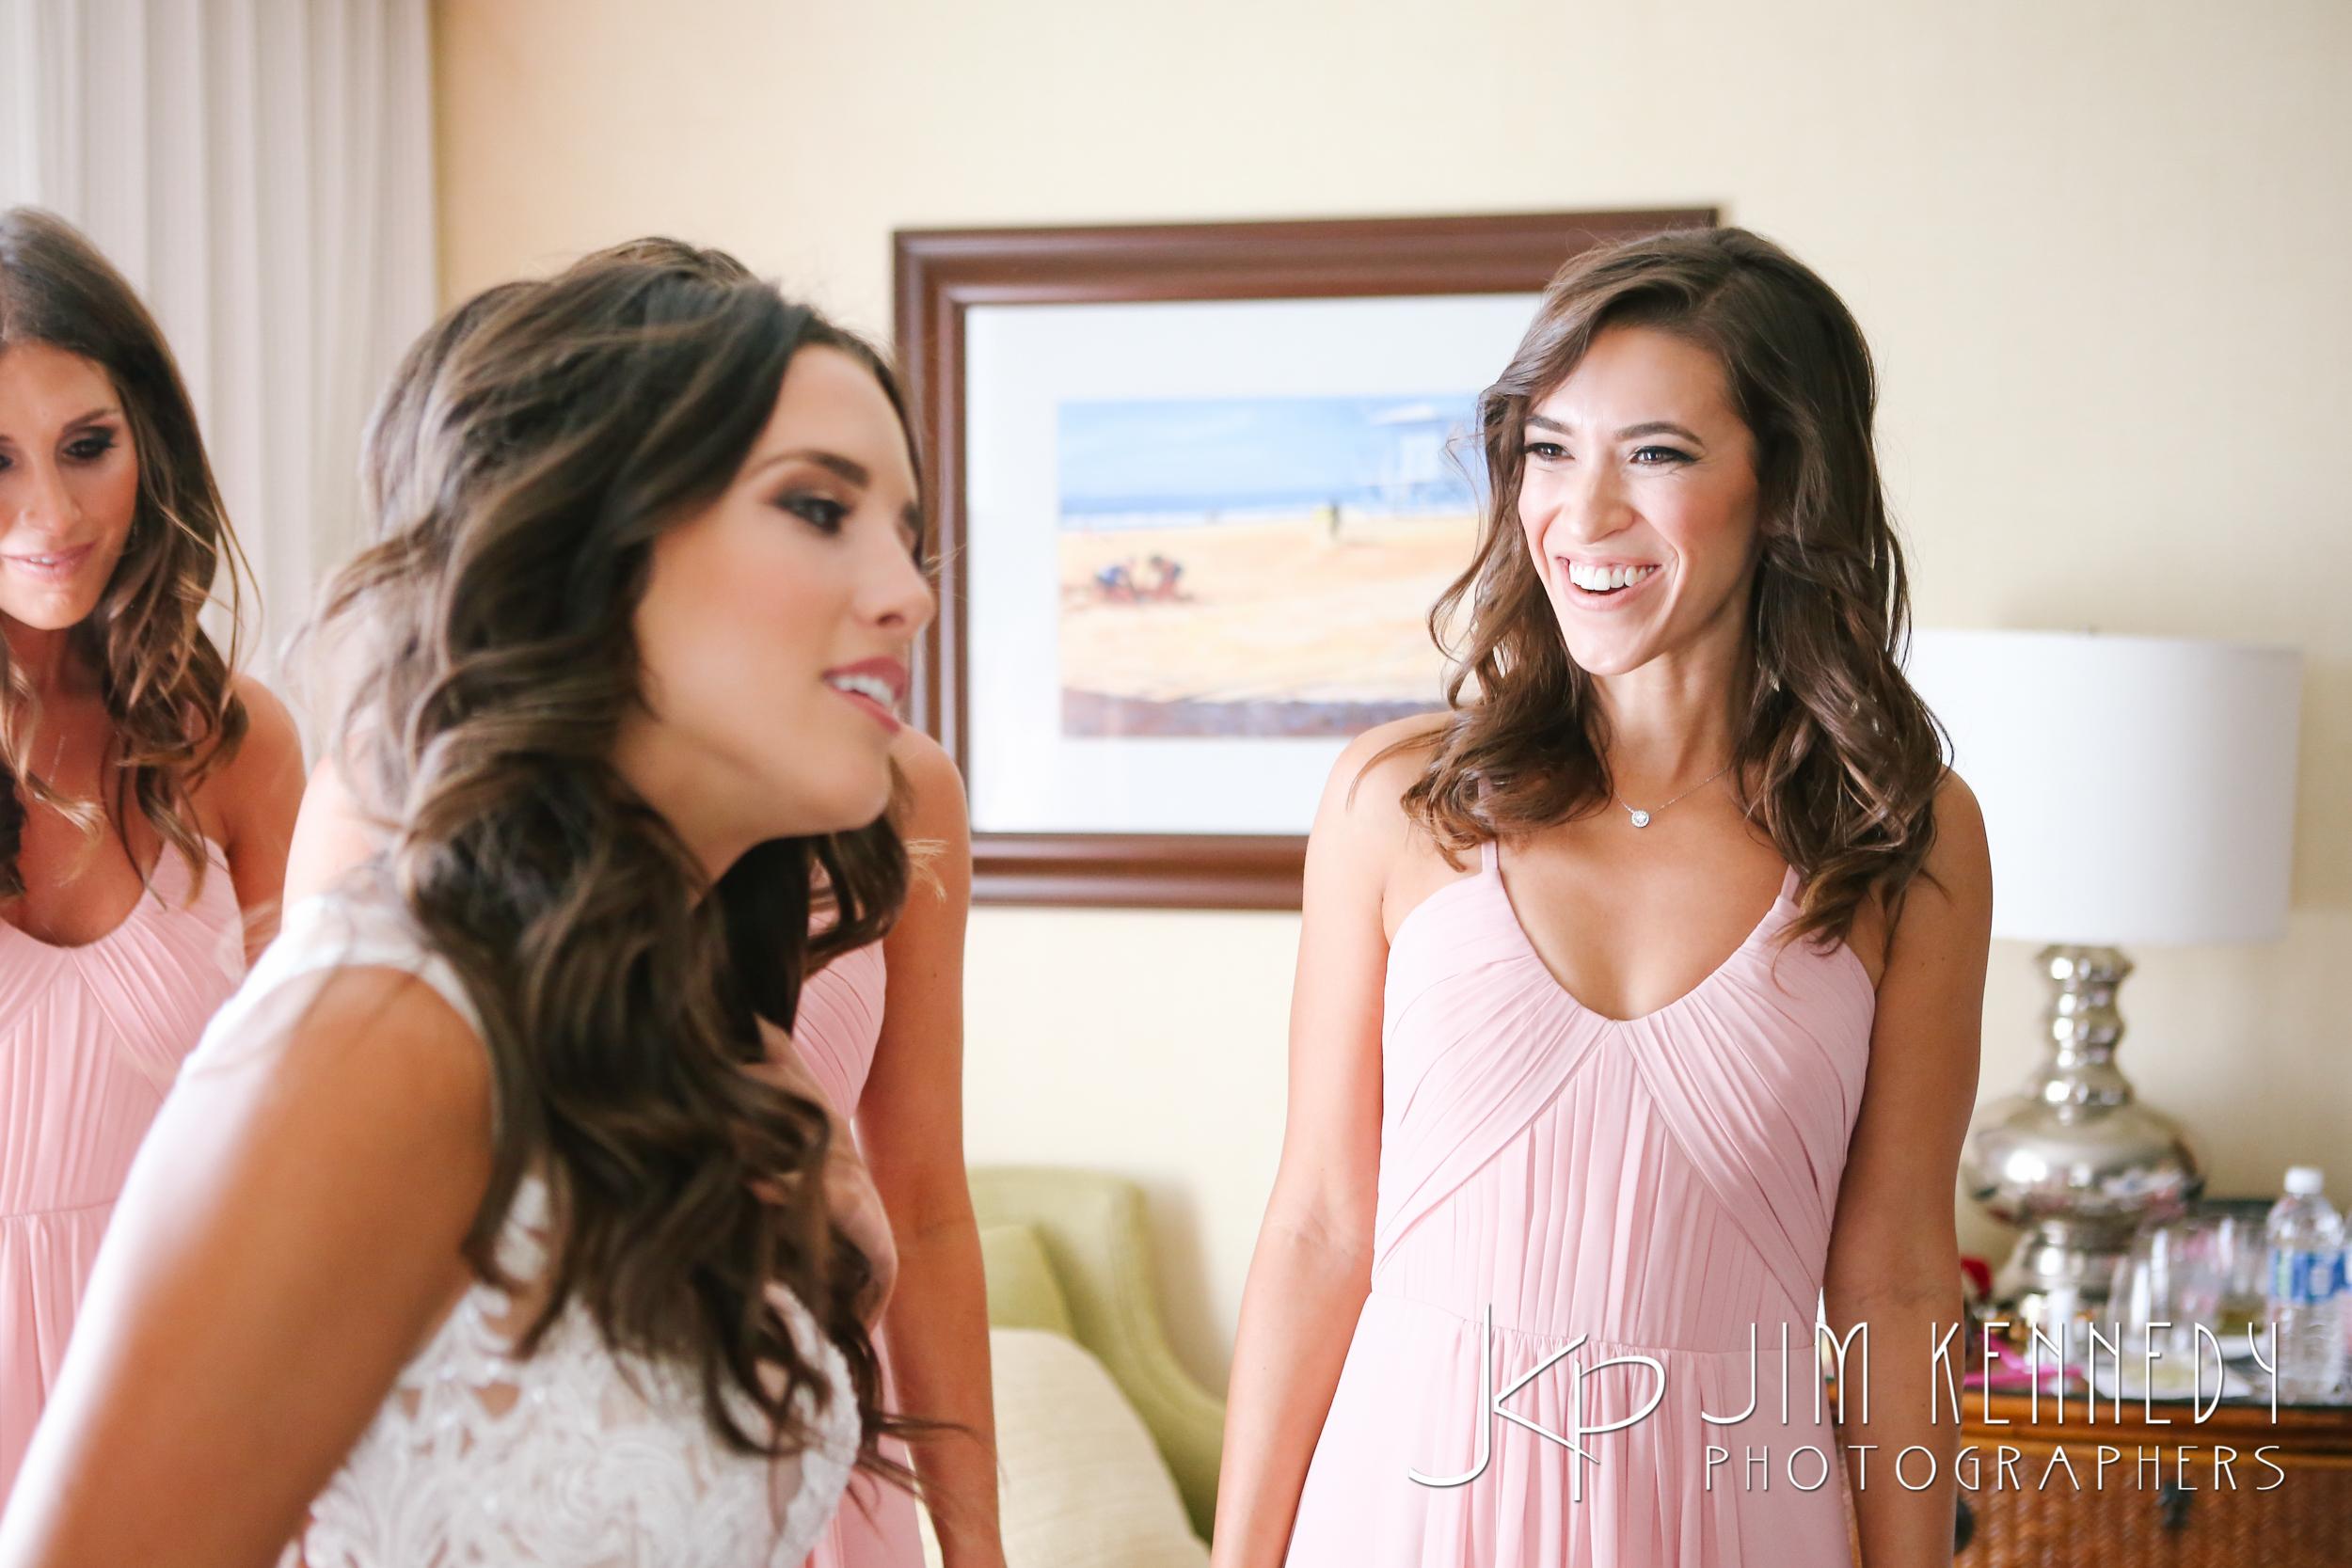 hyatt-huntington-beach-wedding-028.JPG